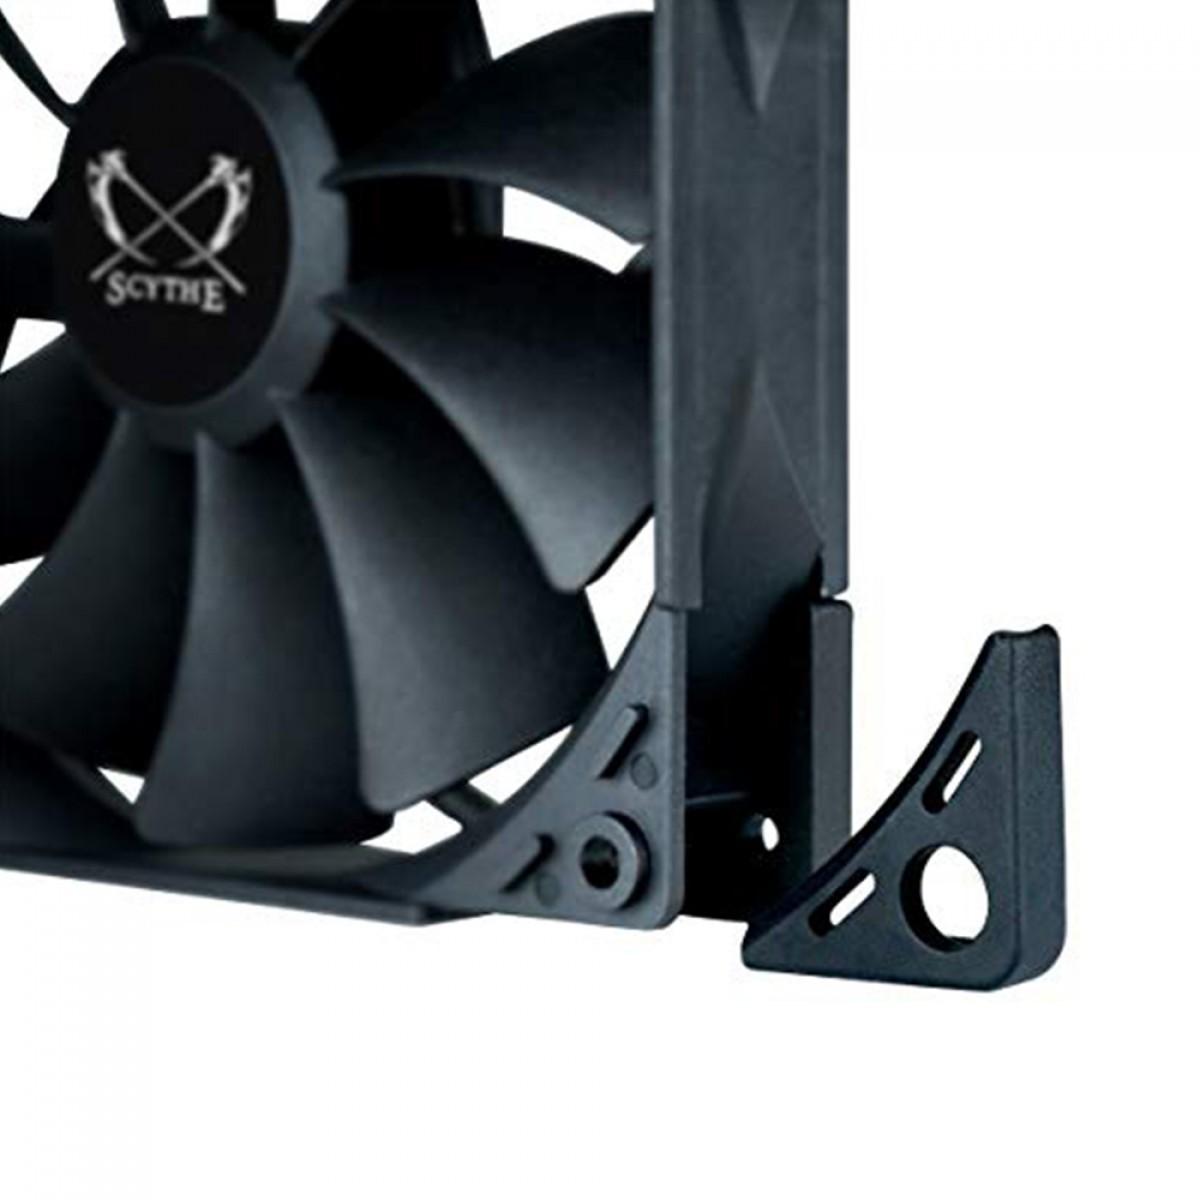 Cooler para Gabinete Scythe Kaze Flex 120mm Black, 1500 RPM, PWM, KF1225FD15B-P